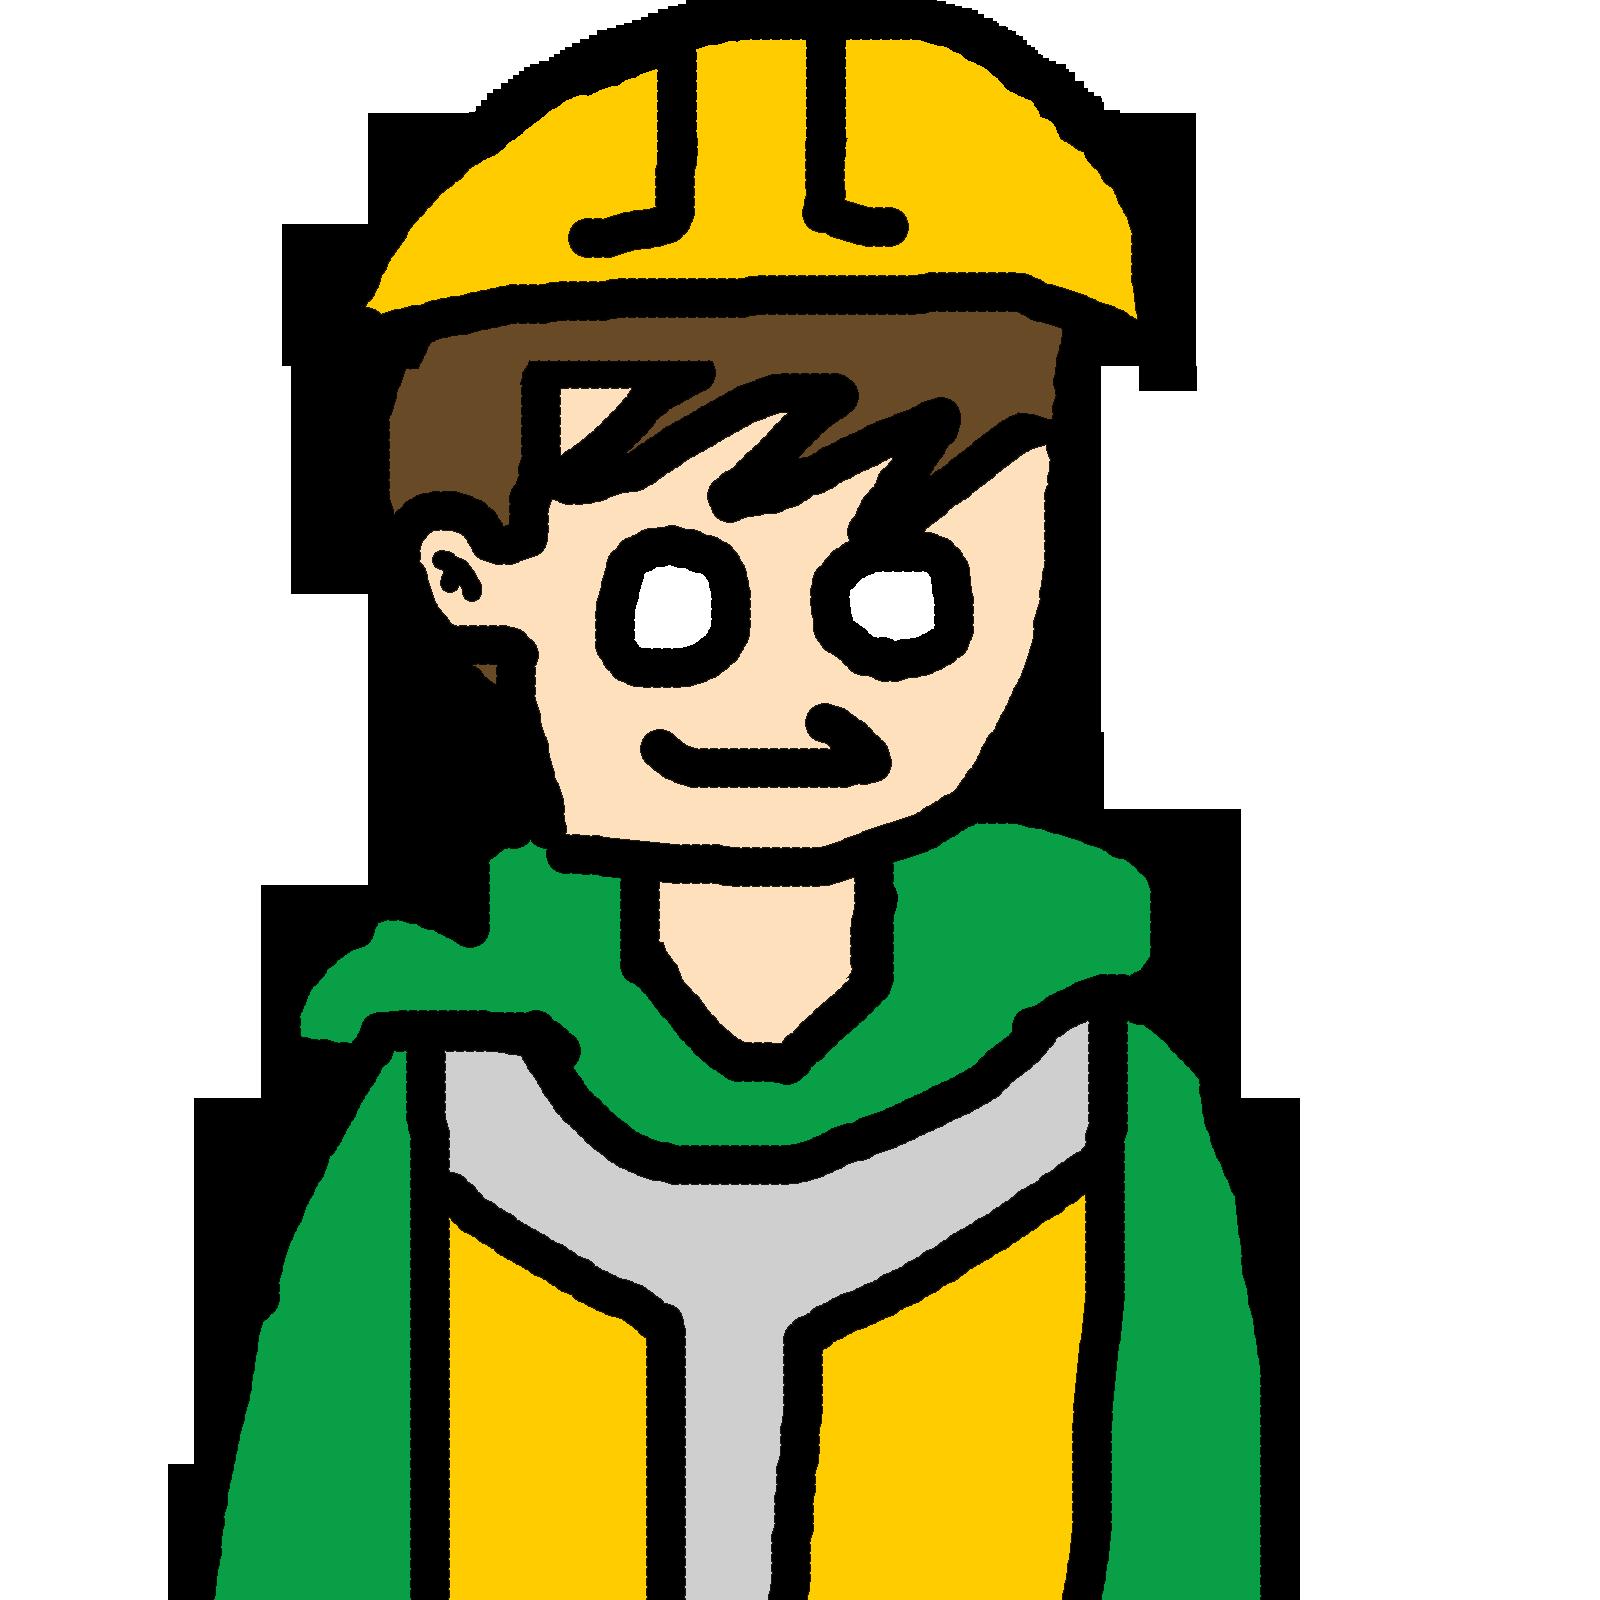 Eddsworld Edd Doodle (H&F)